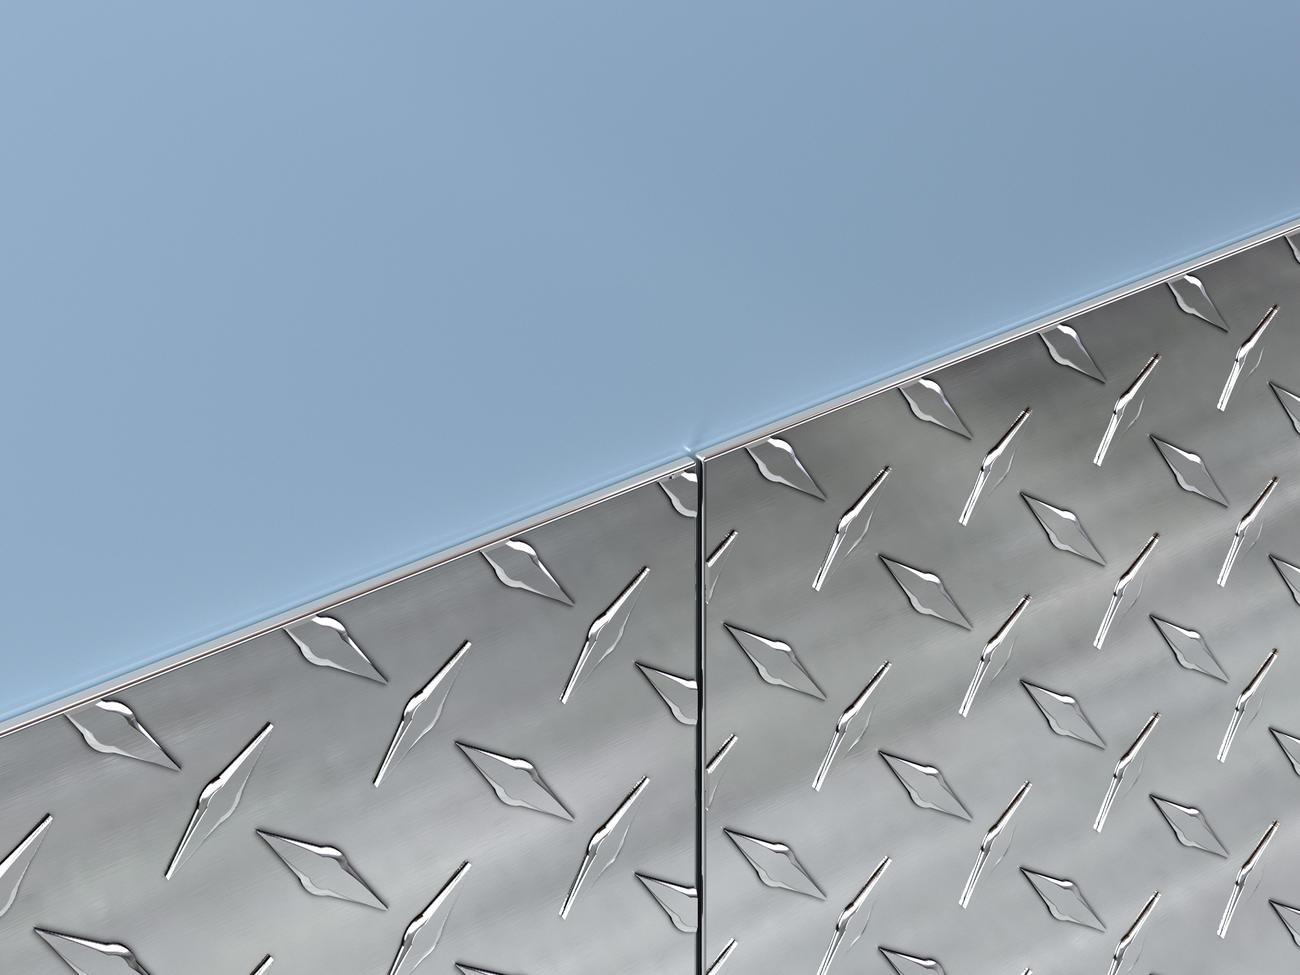 WPAD-12 Aluminum Diamond Plate Wall Covering